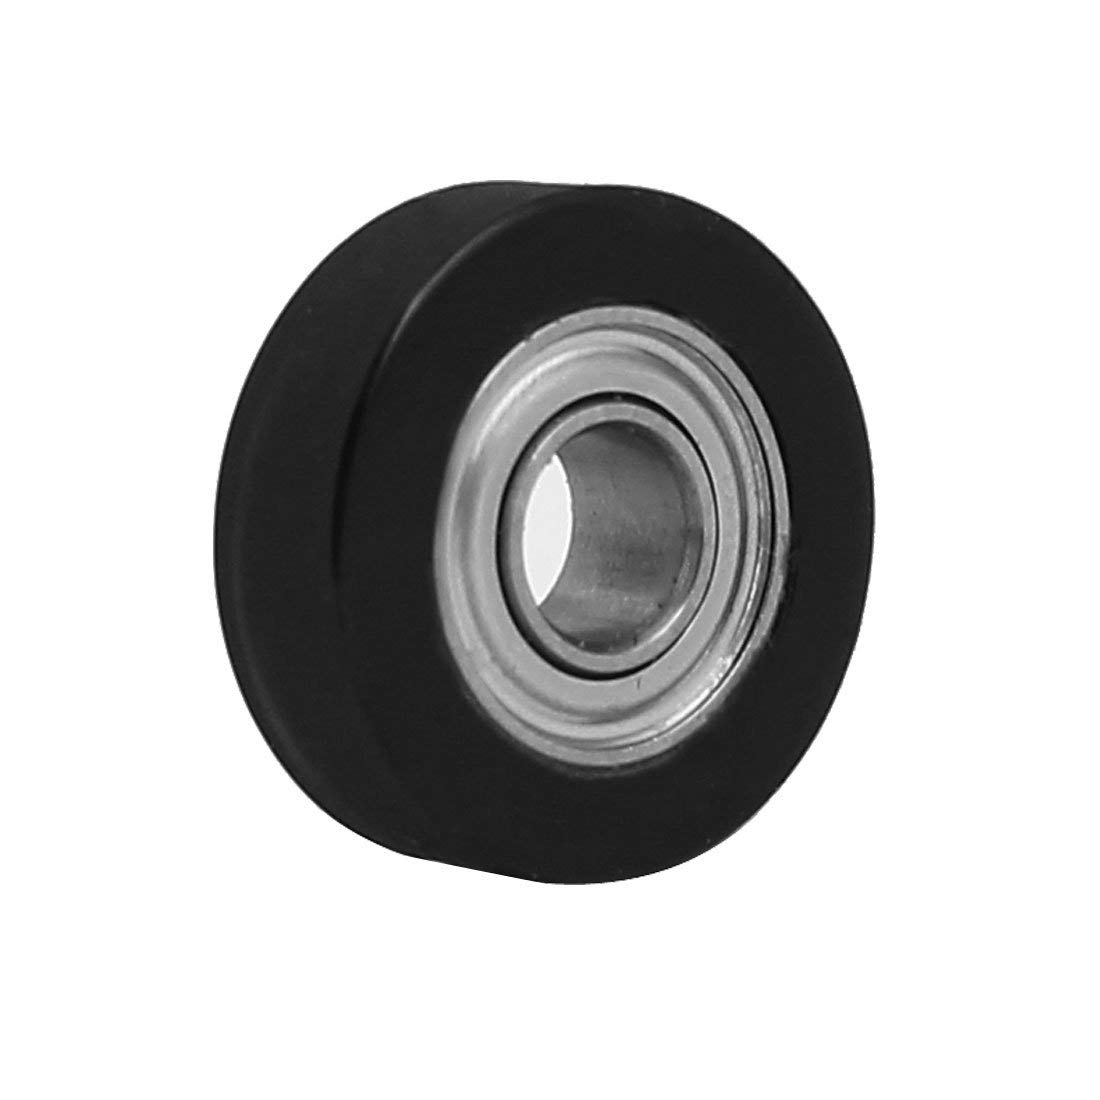 4mm x 13mm x 4mm PU Roller Bearing Pulley Sliding Converyor Wheel Black